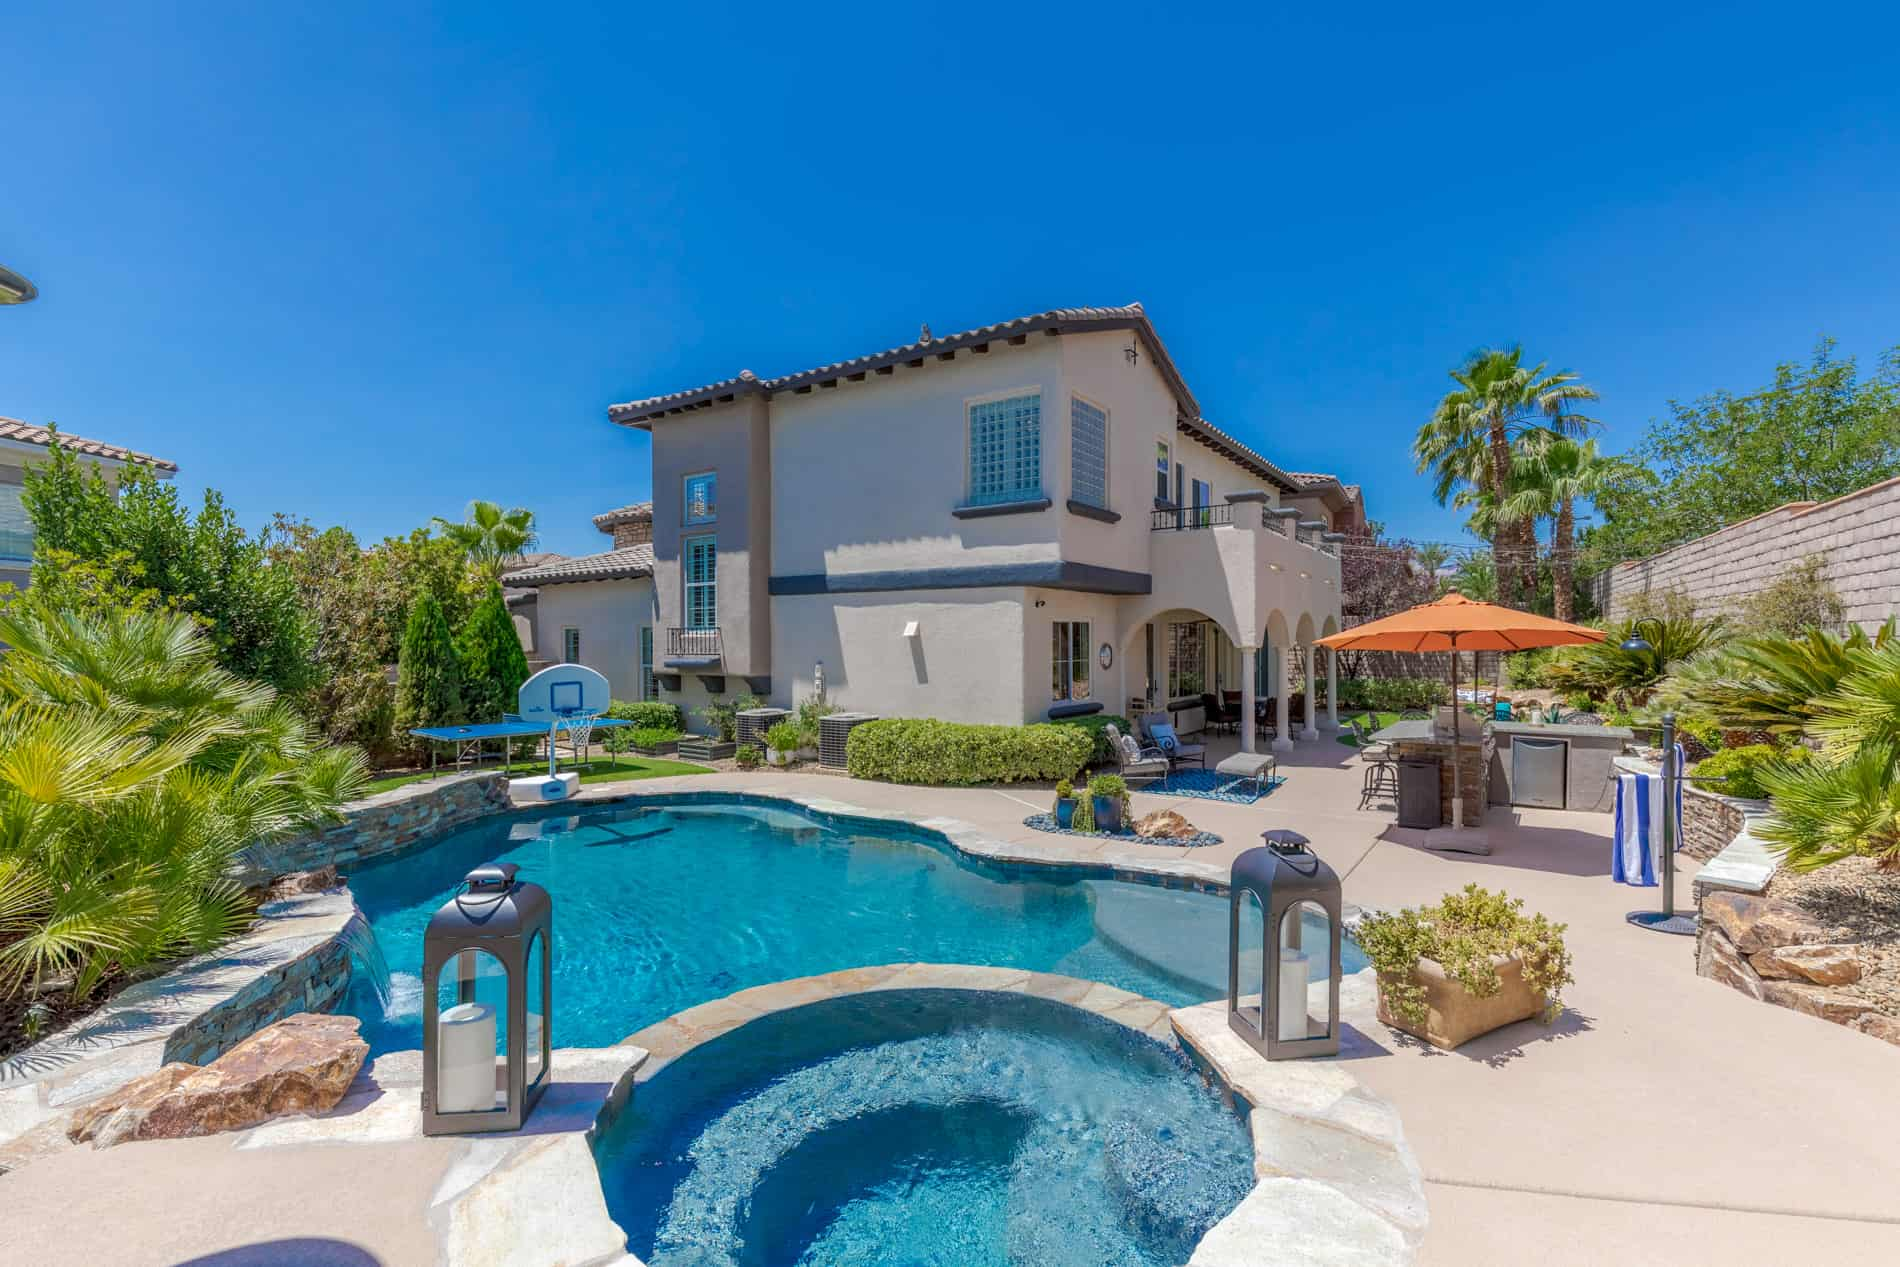 las-vegas-luxry-real-estate-realtor-rob-jensen-company-12108-vista-linda-avenue-the-paseos071